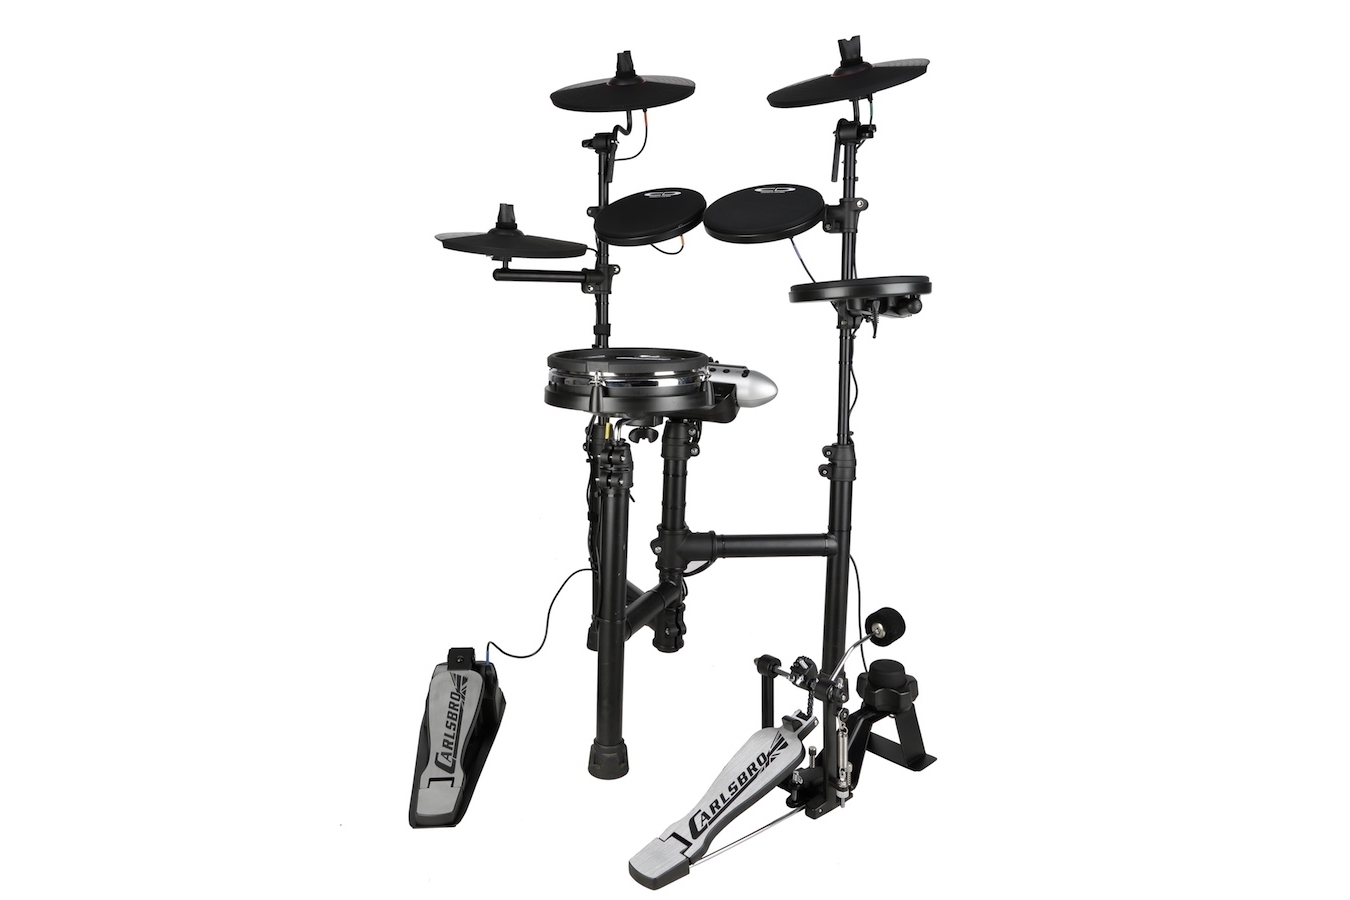 Carlsbro Csd130m Compact Electric Drum Kit W Mesh Snare